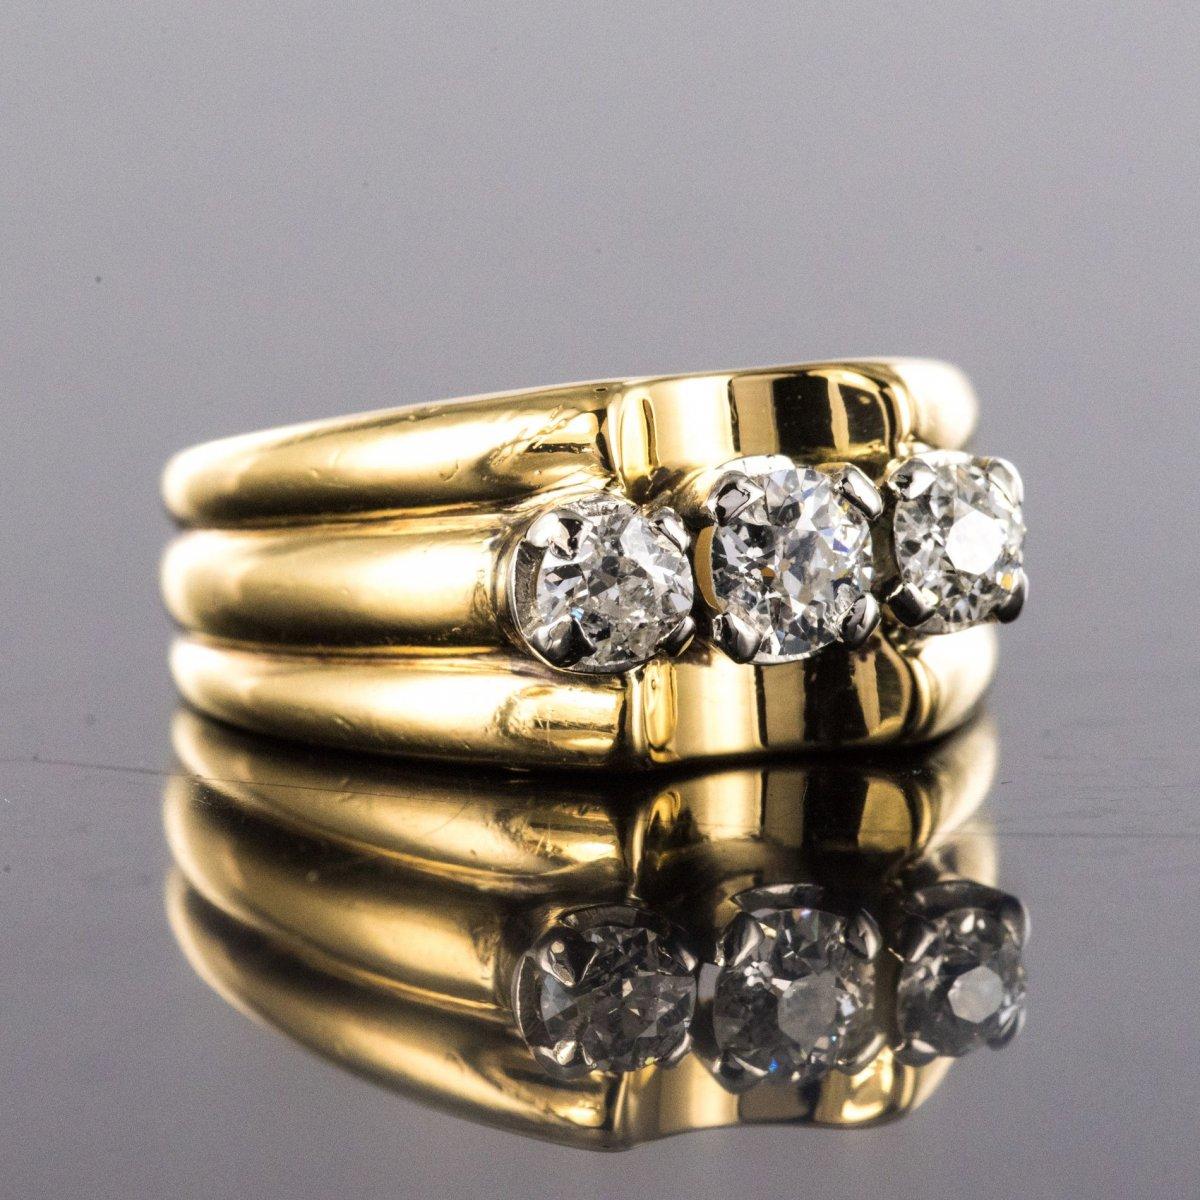 Bague Tank Or Jaune 3 Diamants-photo-6